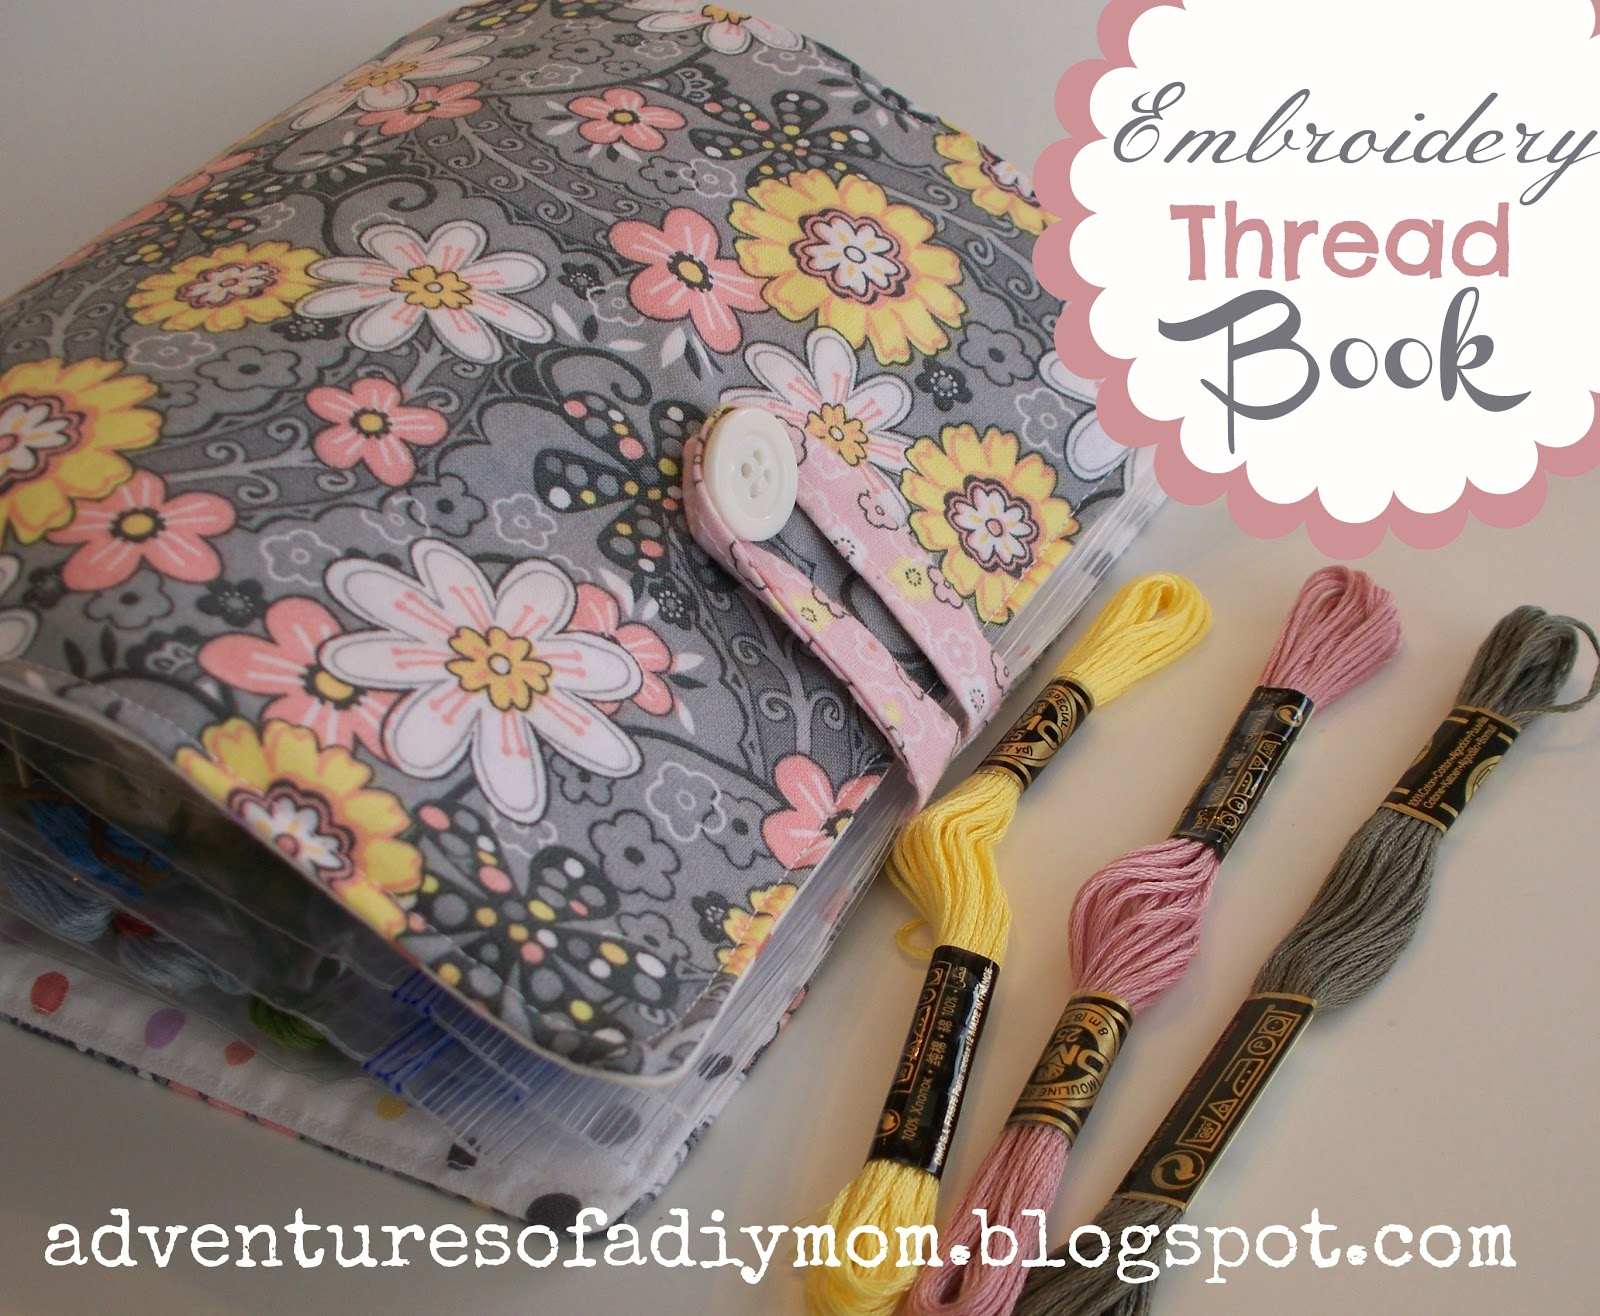 Embroidery Thread Book  Tutorial  Adventures Of A DIY Mom